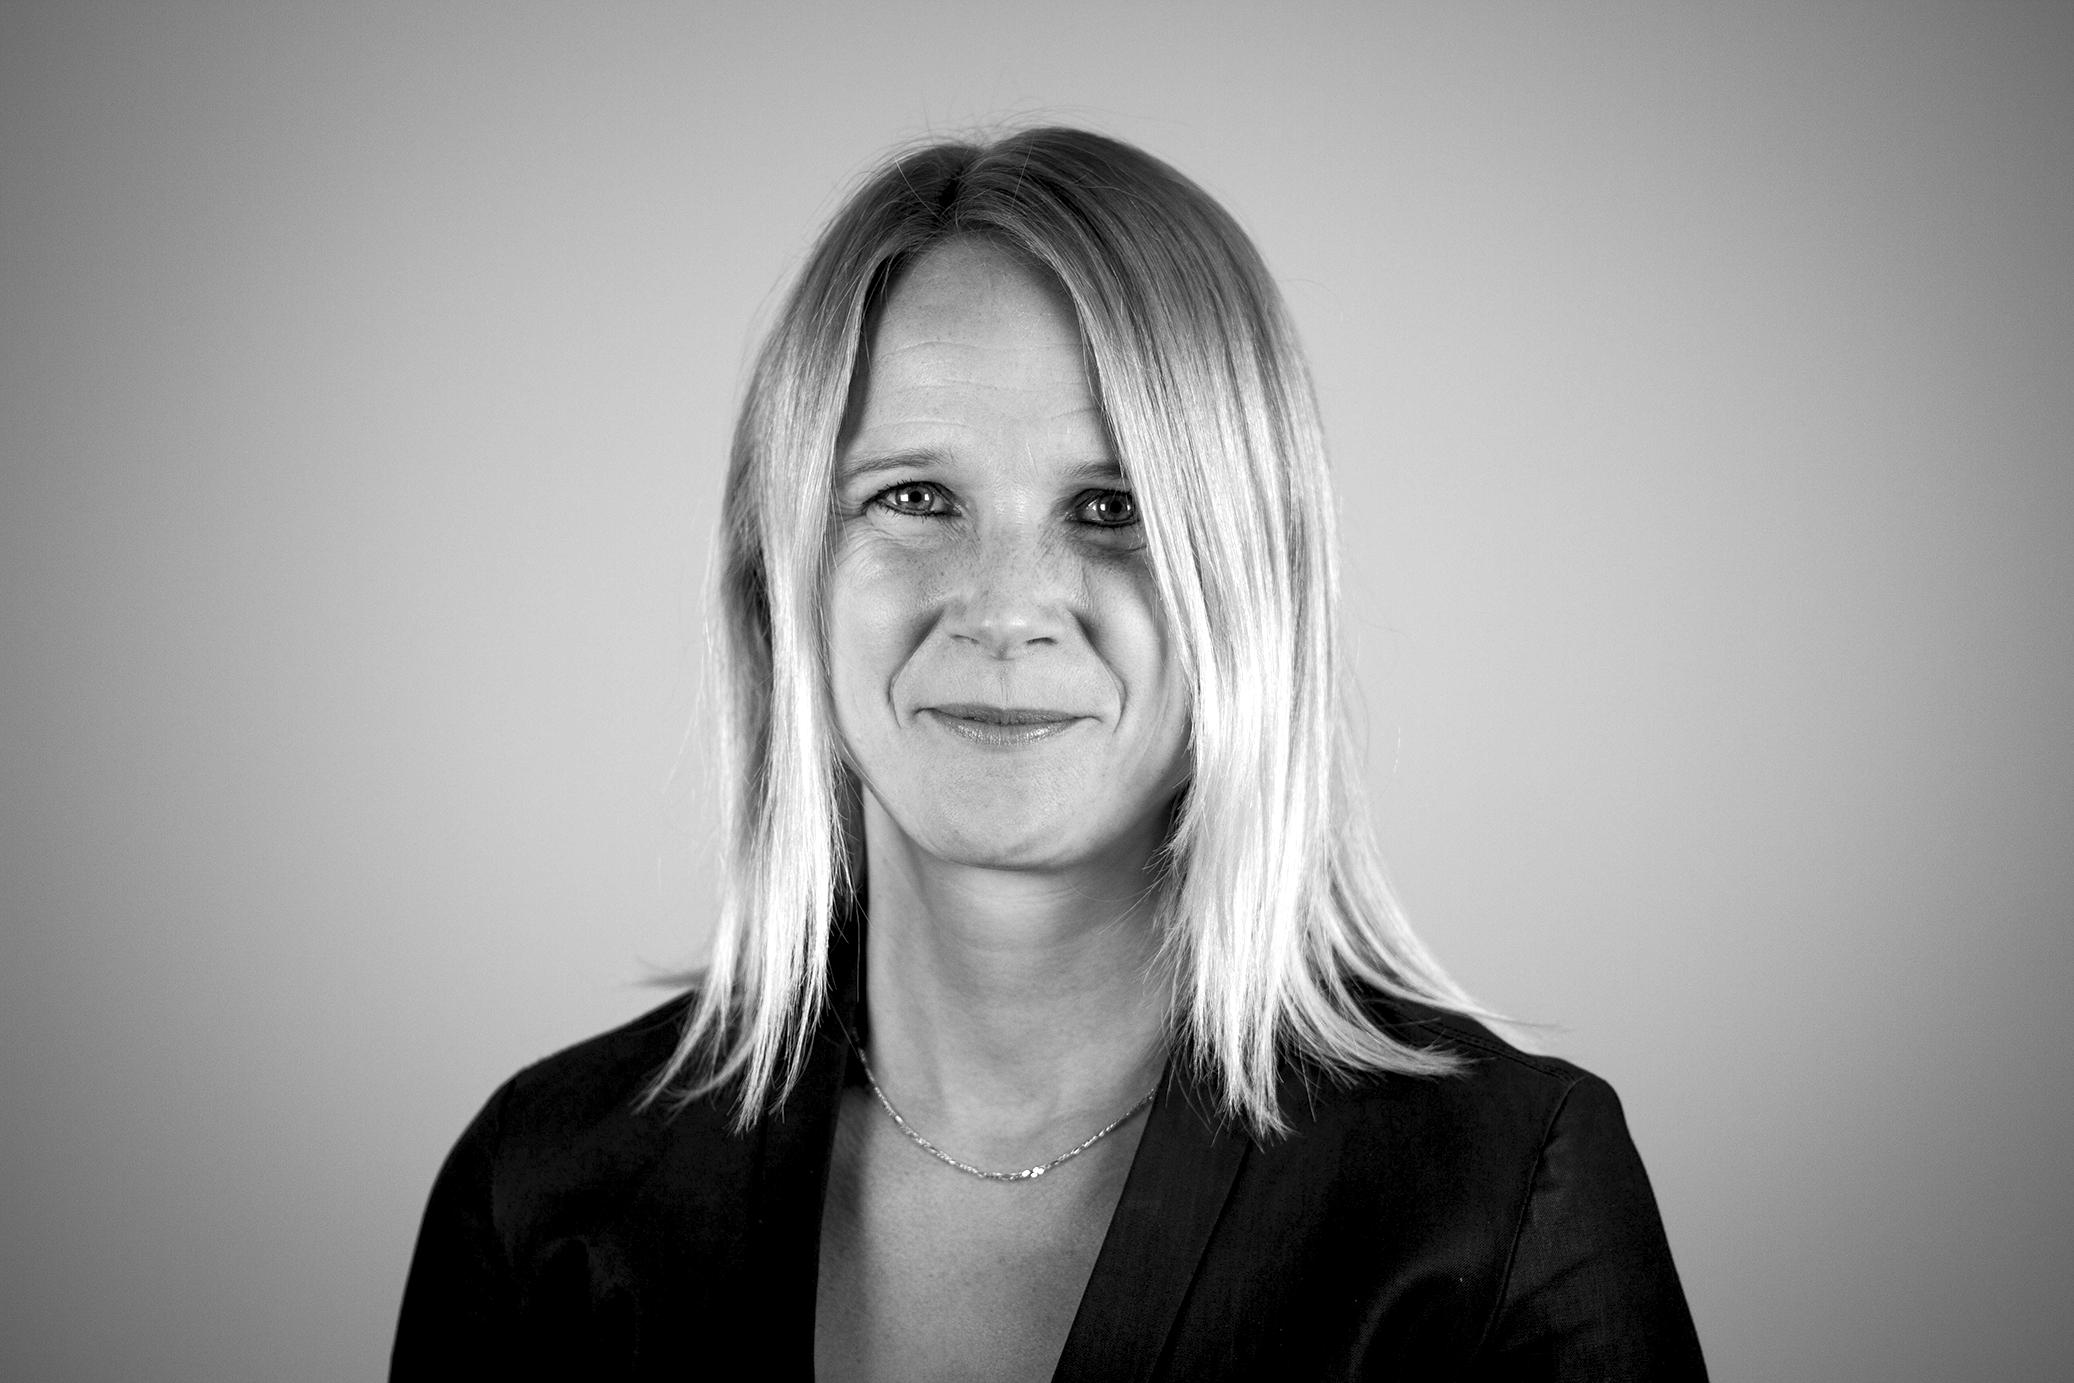 Anneli Johansson